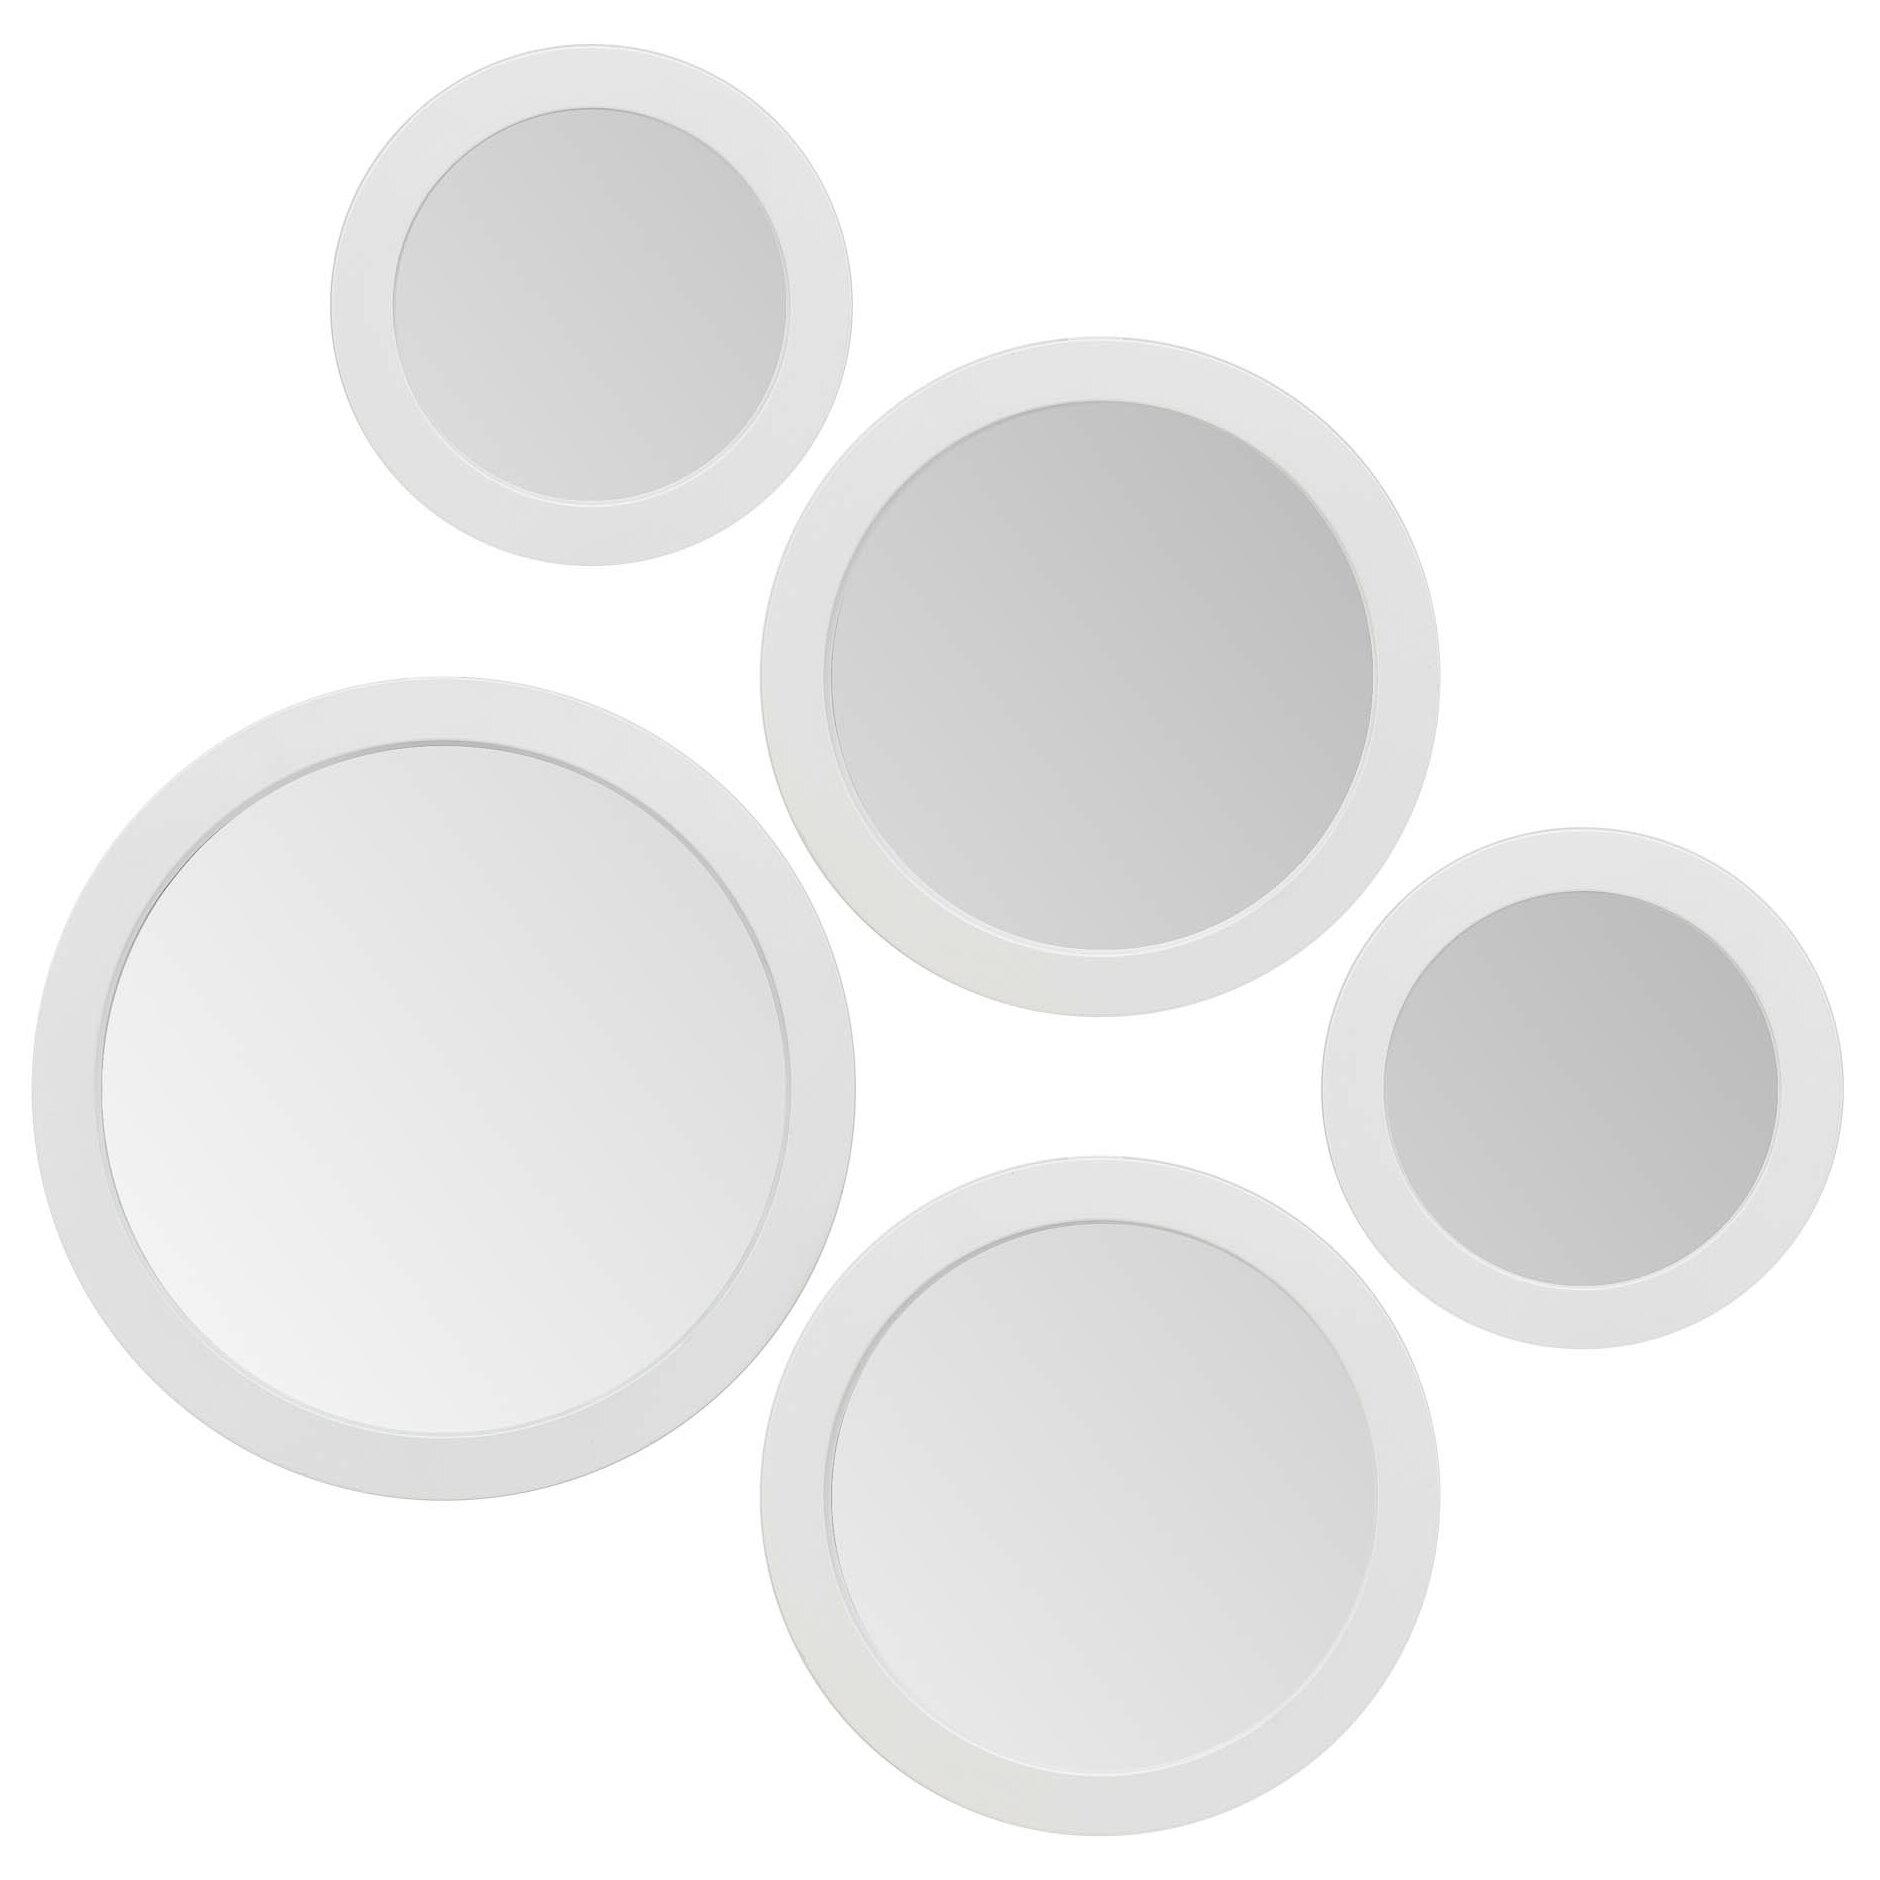 Ebern Designs 5 Piece Akiana Round Modern Contemporary Accent Mirror Set Reviews Wayfair Ca